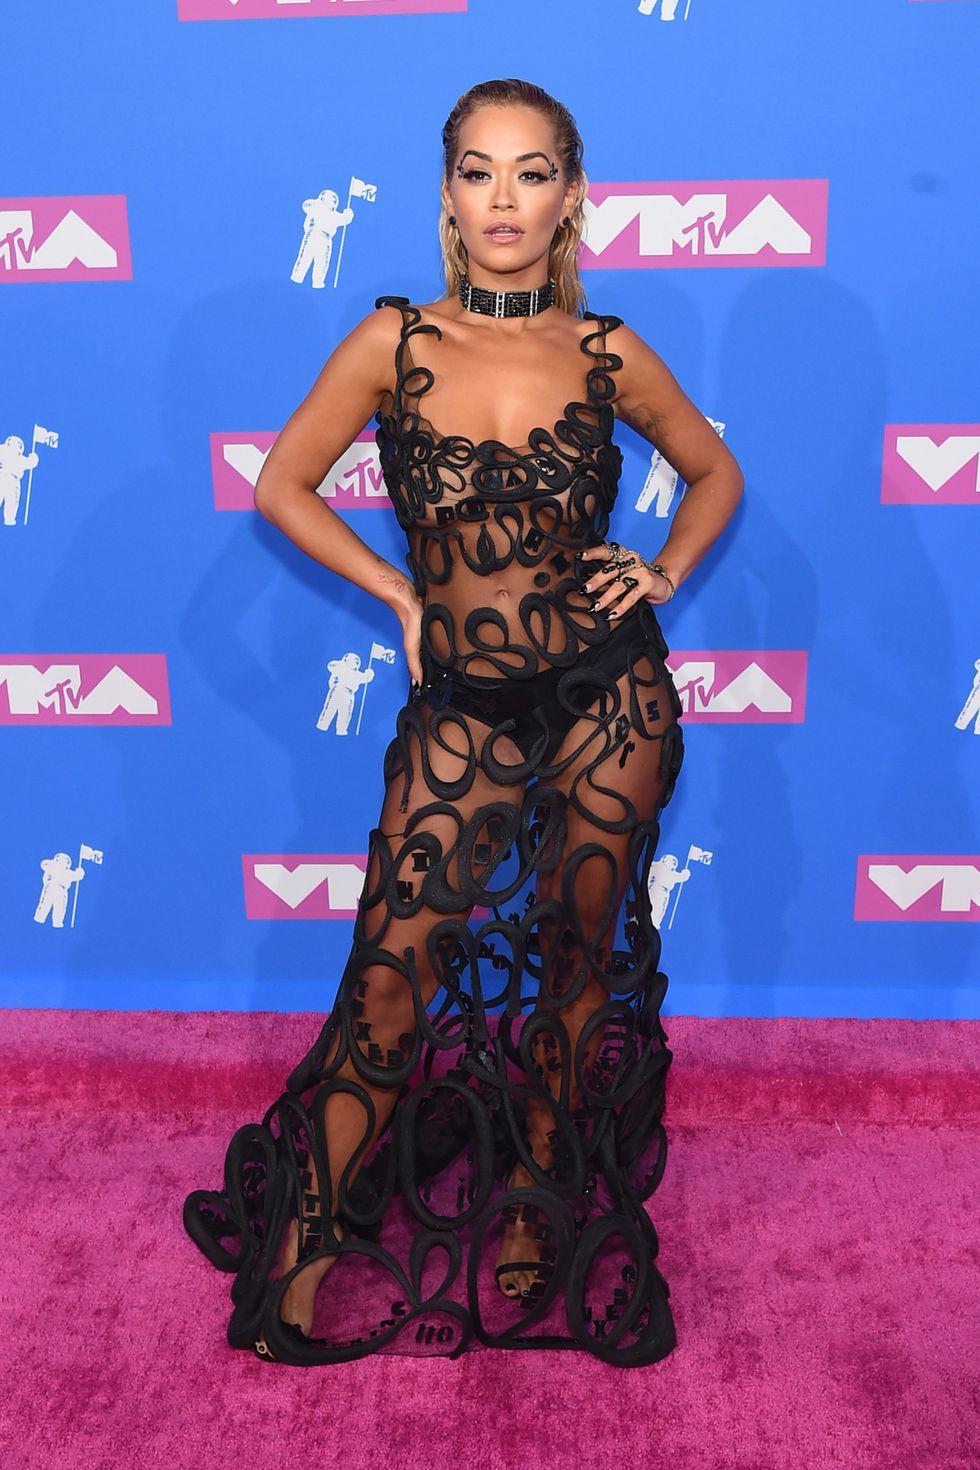 Cele mai sexy ținute la MTV VMA 2018 (GALERIE FOTO)